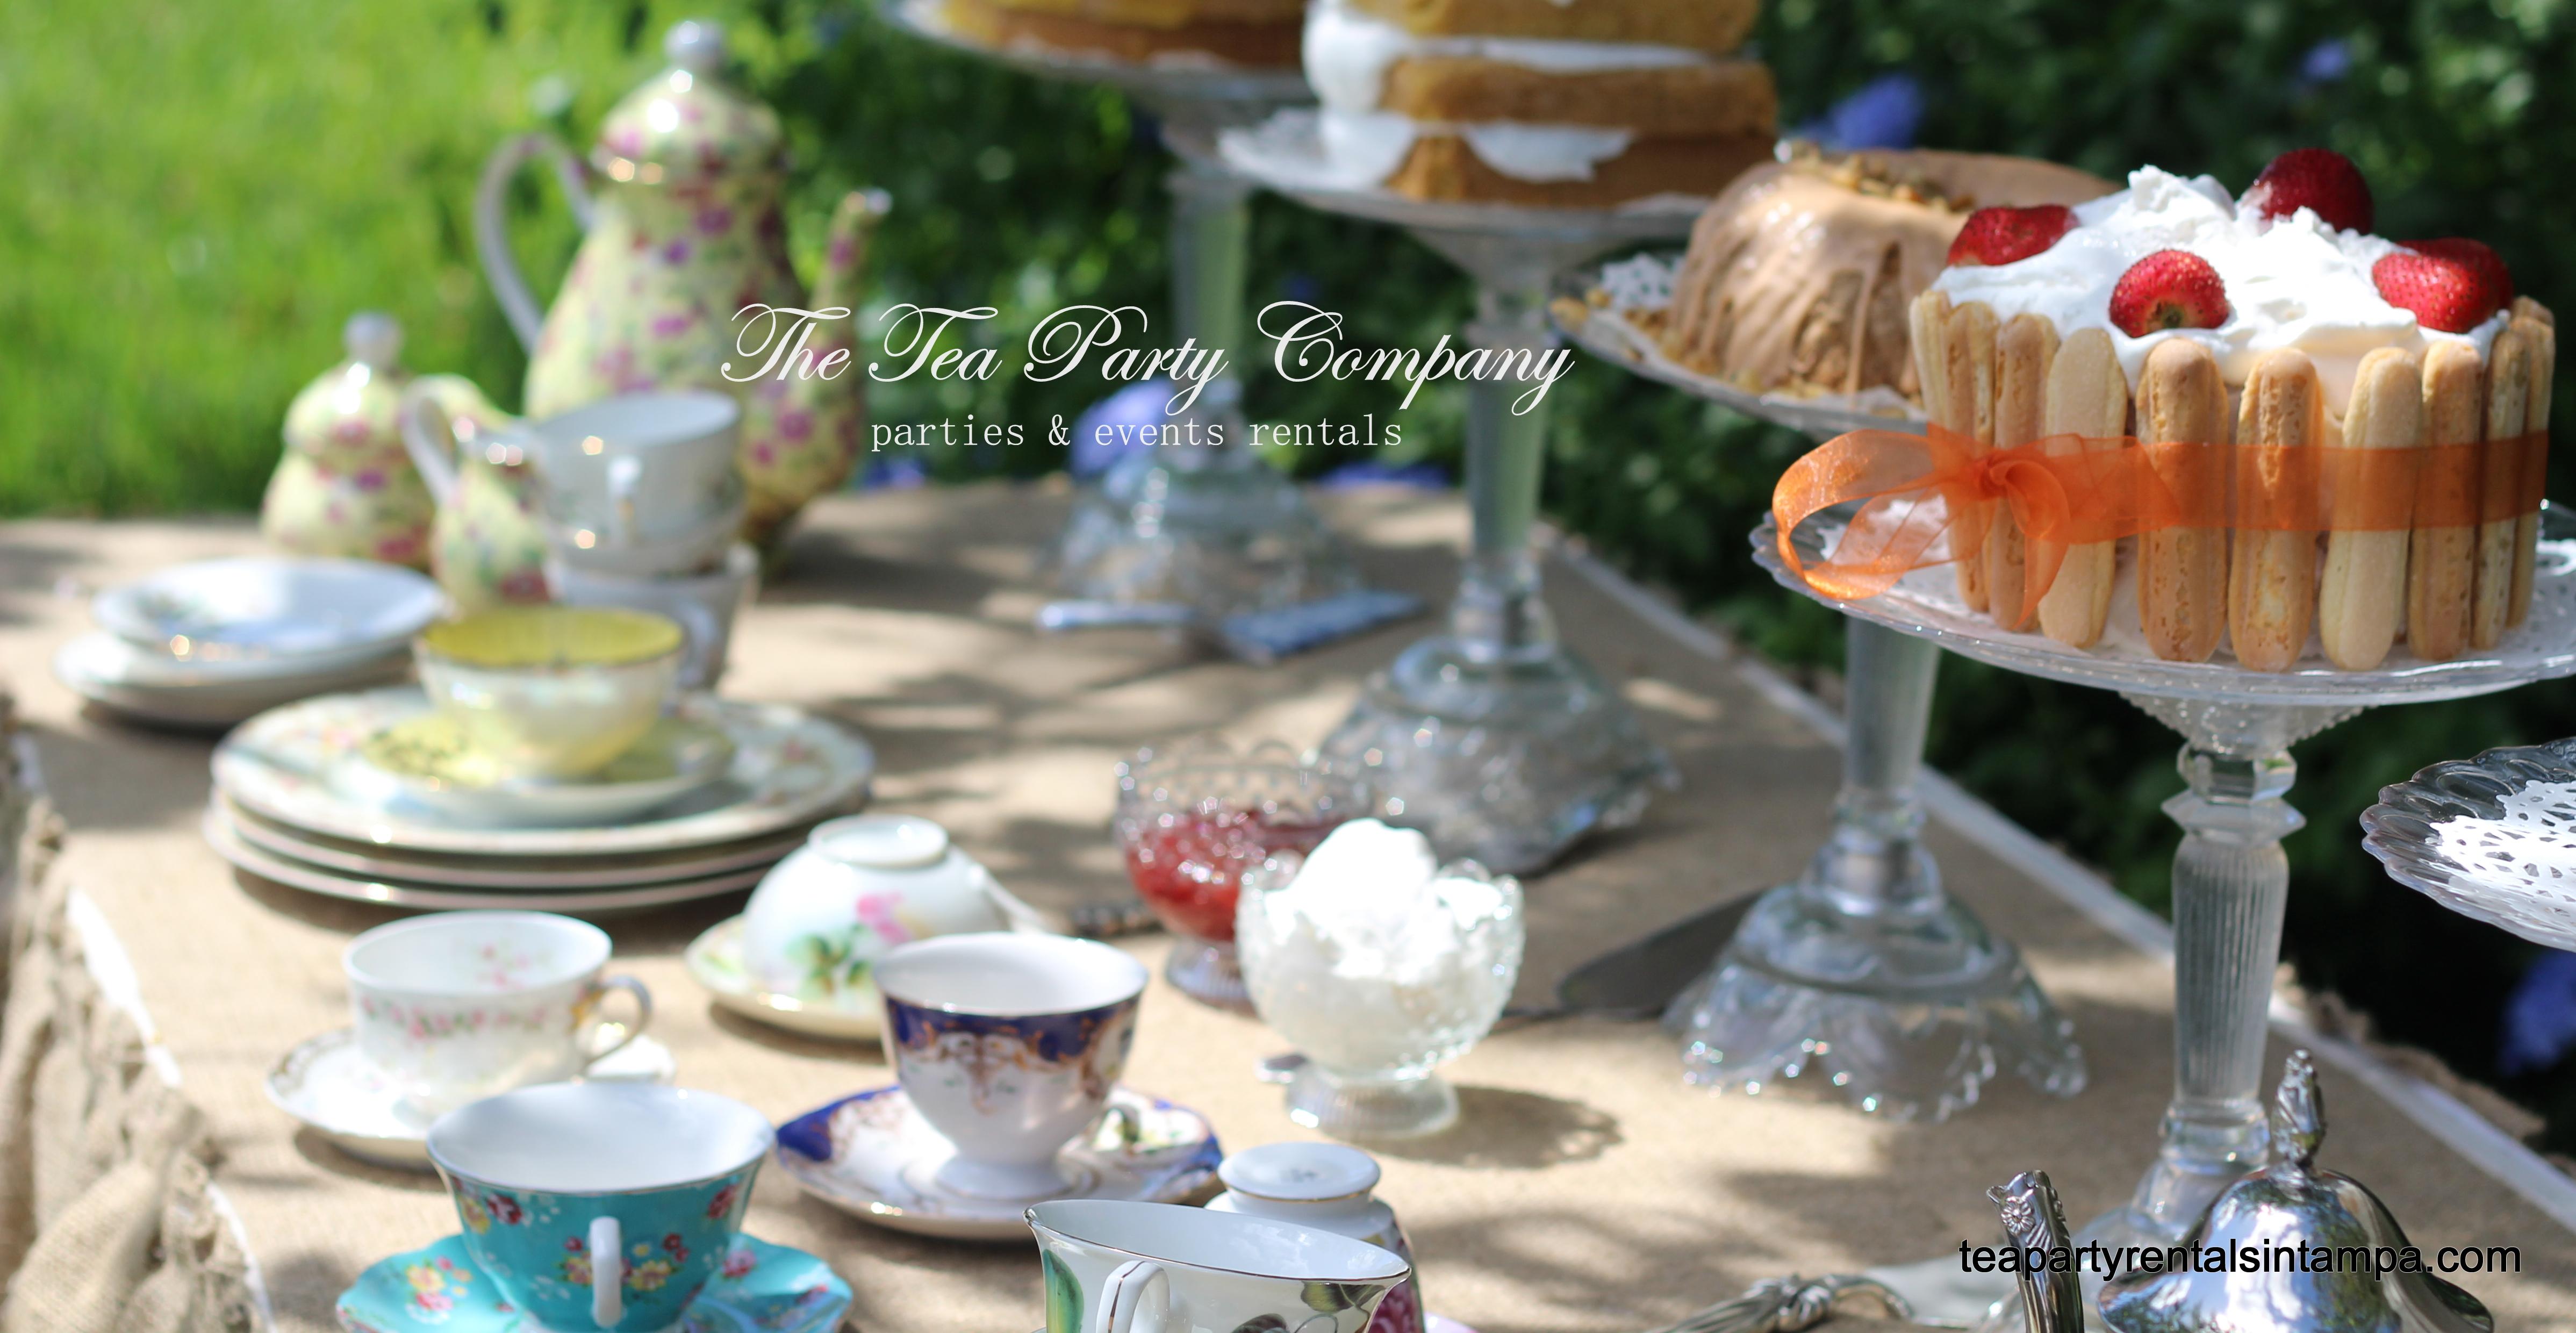 The Tea Party Company Parties Events Fabricators